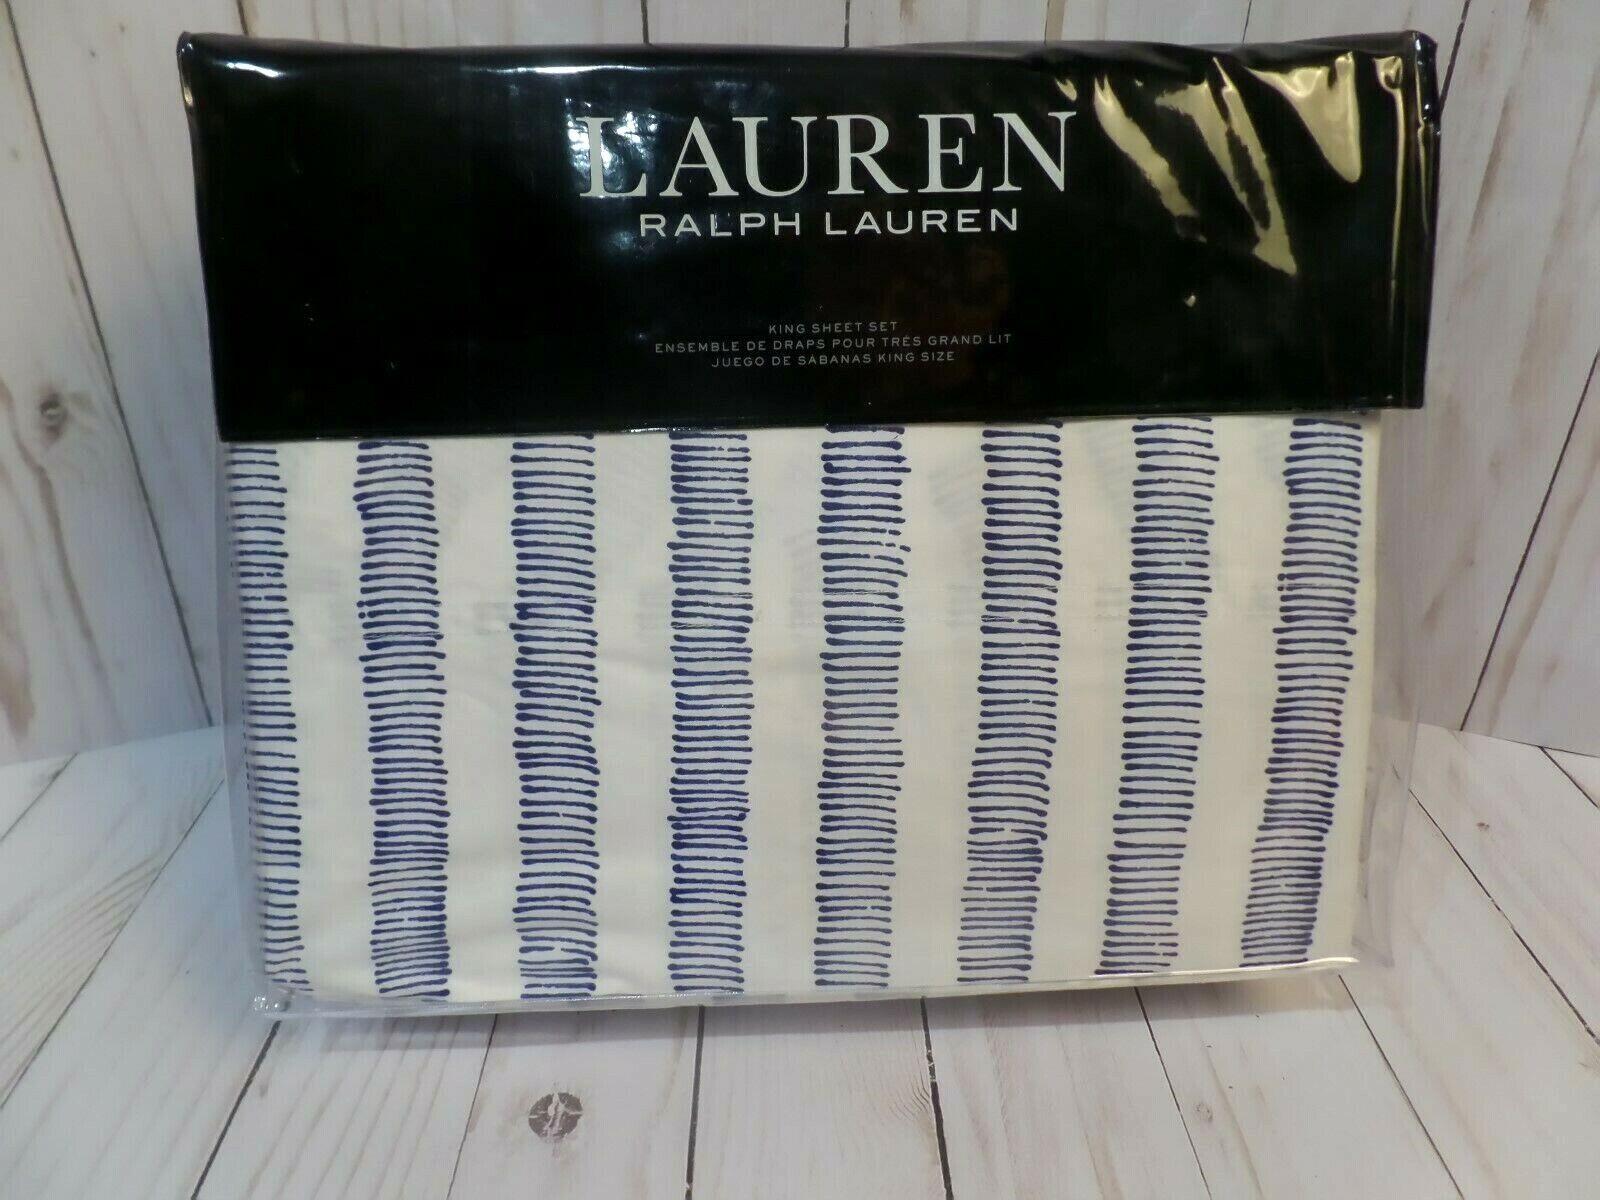 Ralph Lauren ANNALISE STRIPE King Sheet Set  4 pc NEW  220 - FREE 2 DAY FEDEX